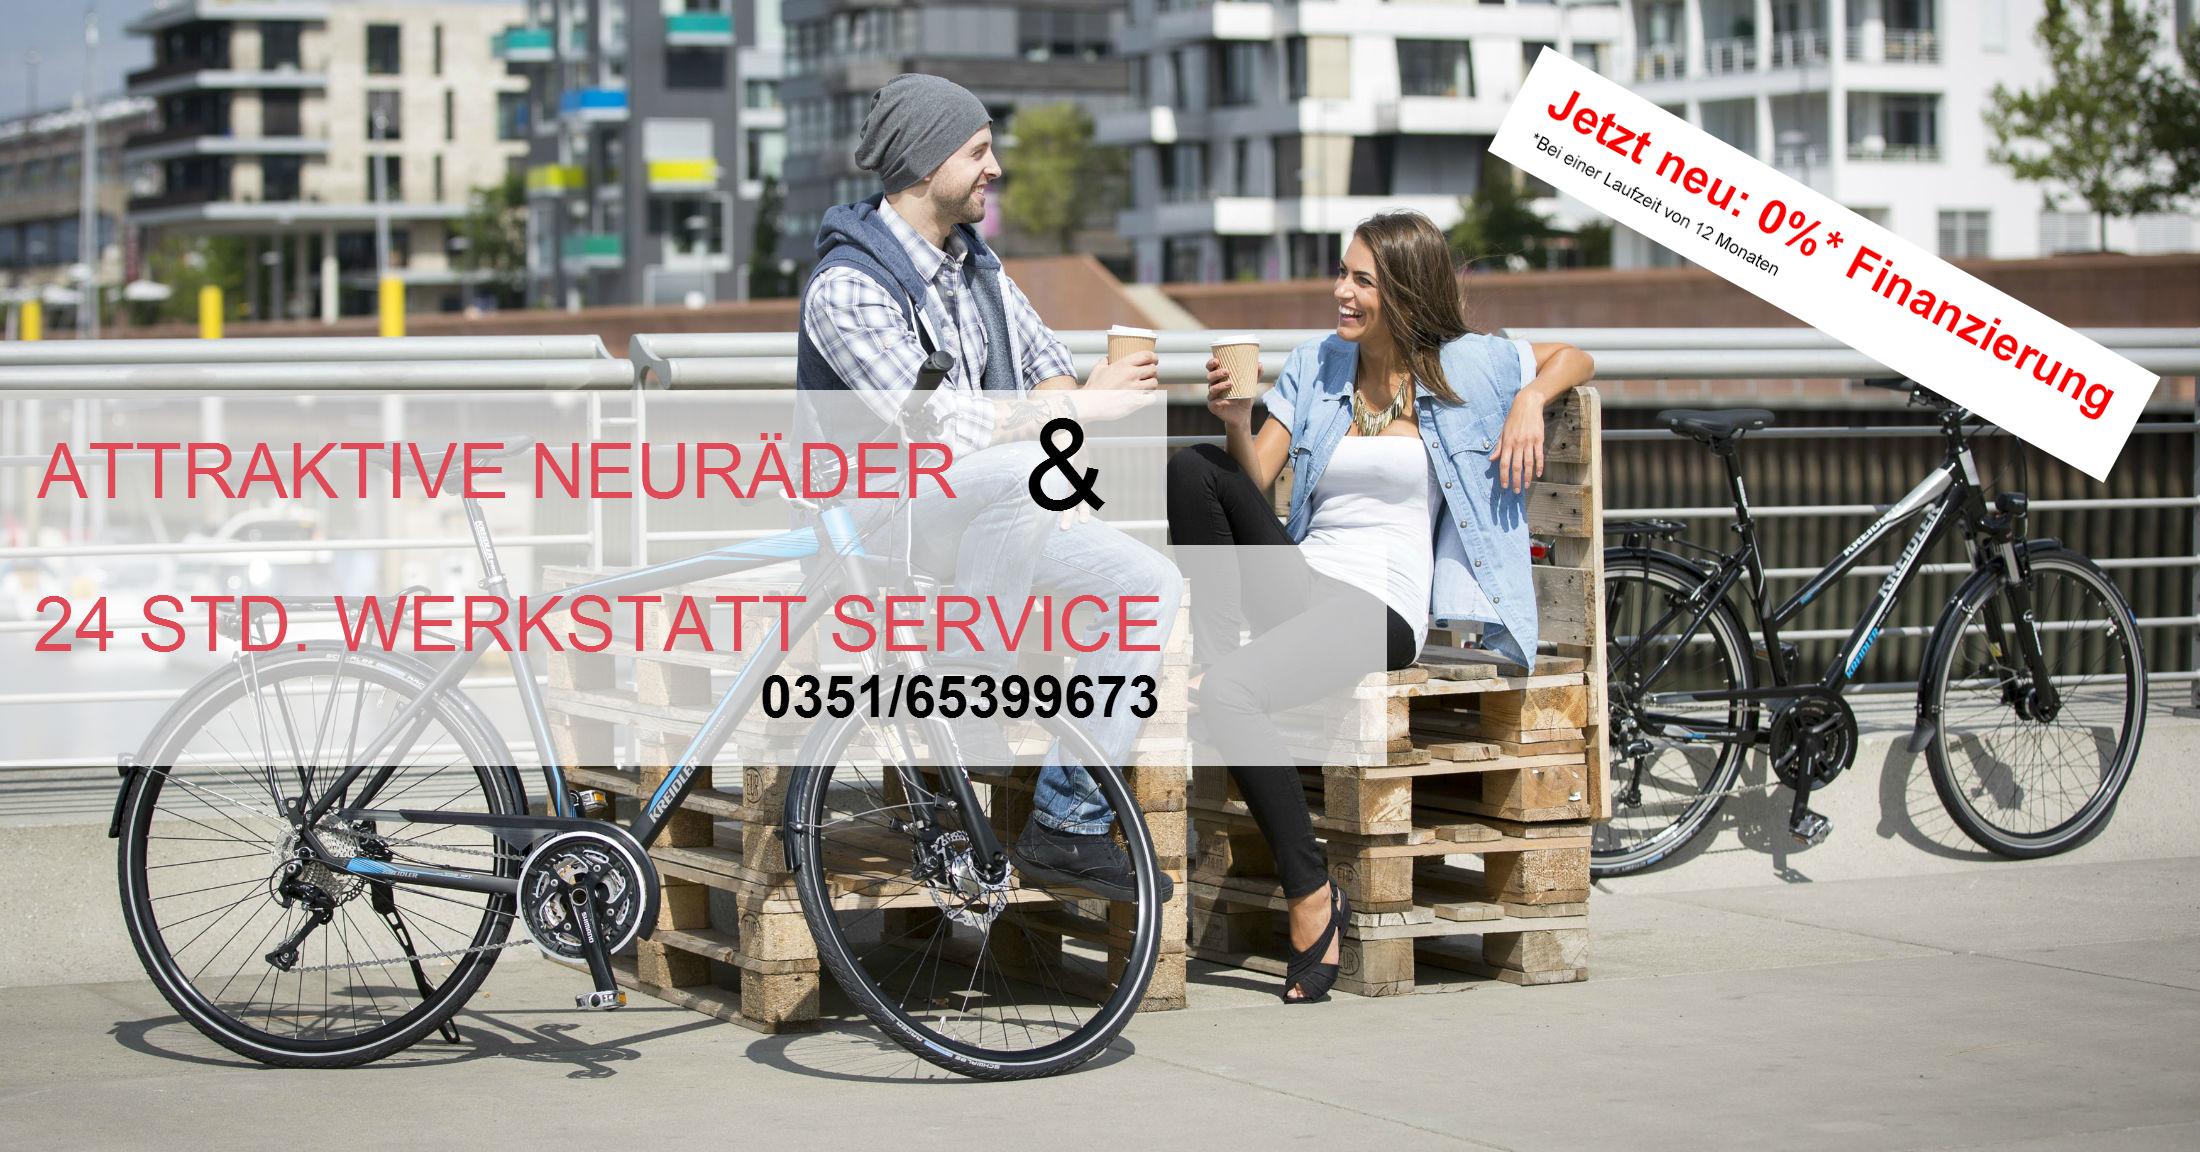 Kreidler_Trekking_header-fin1